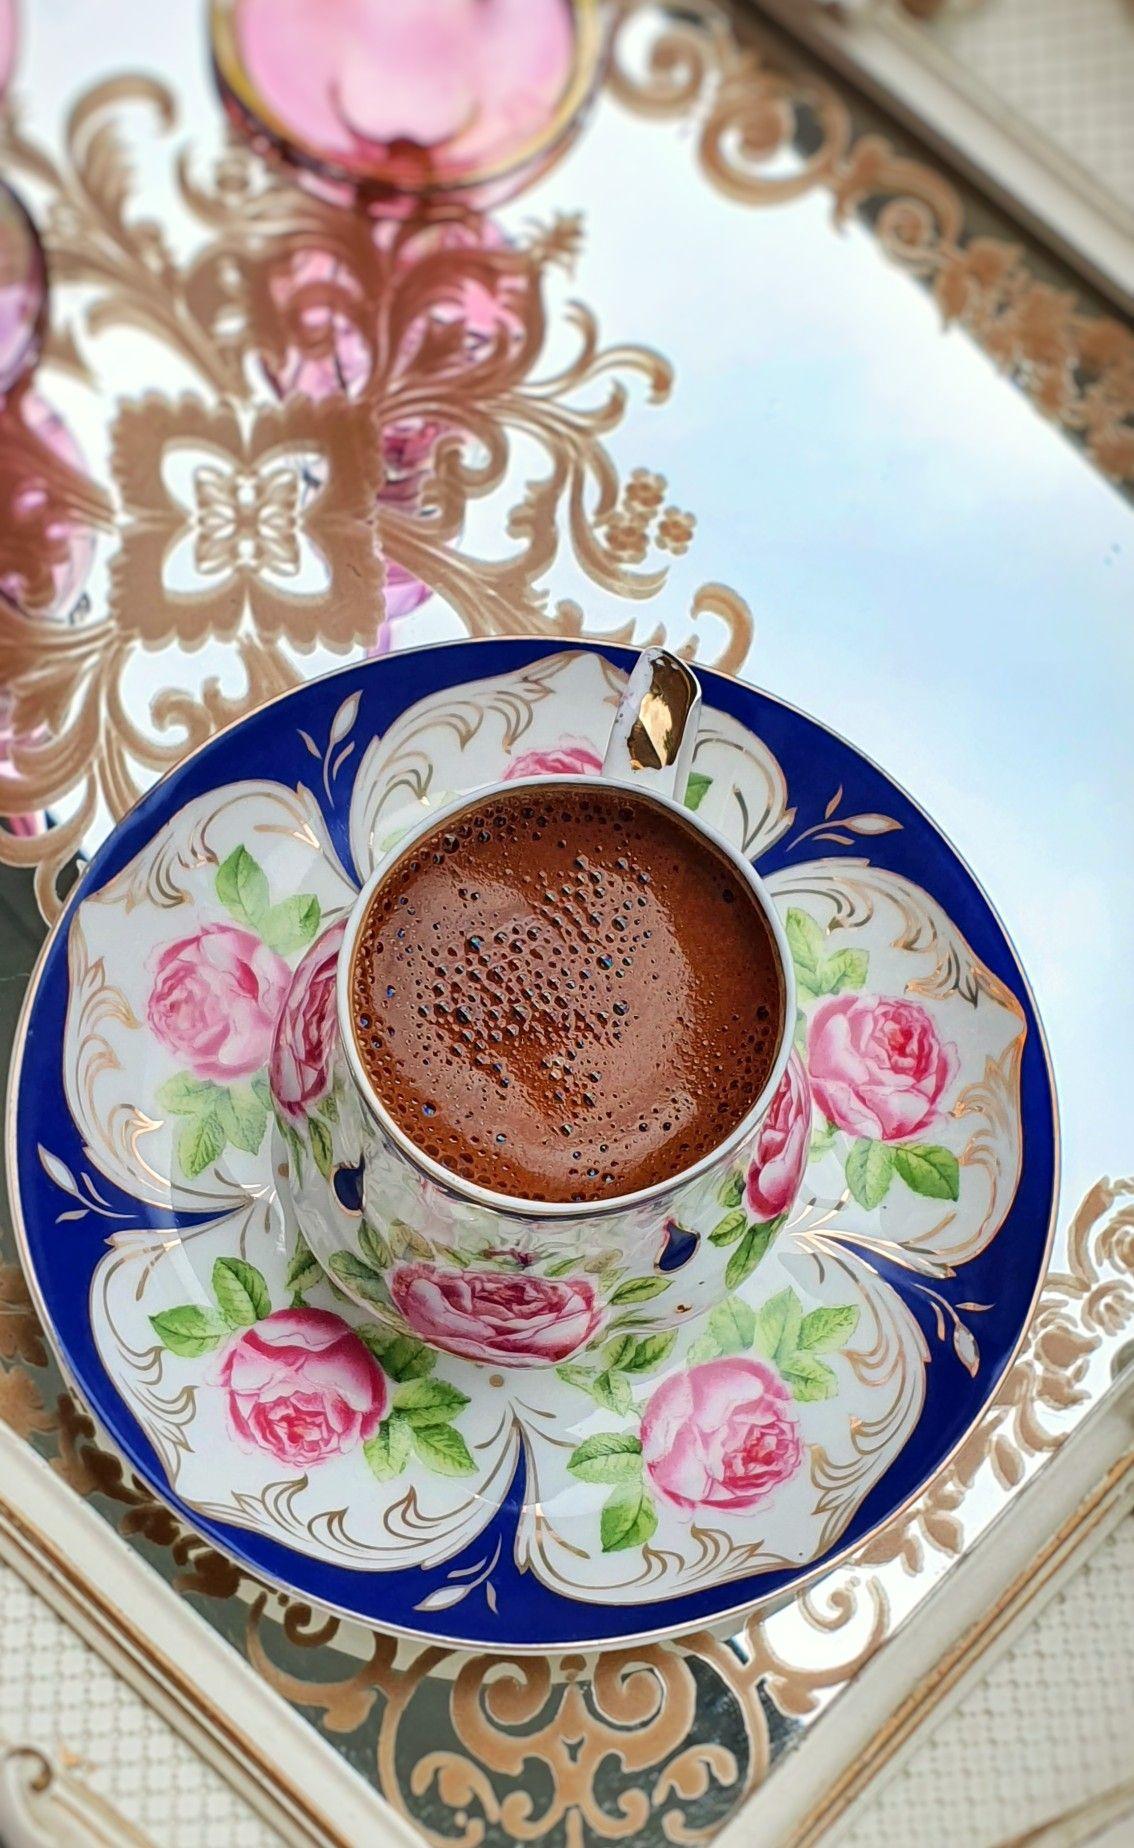 #turkishcoffee #coffee #happyday #sunum